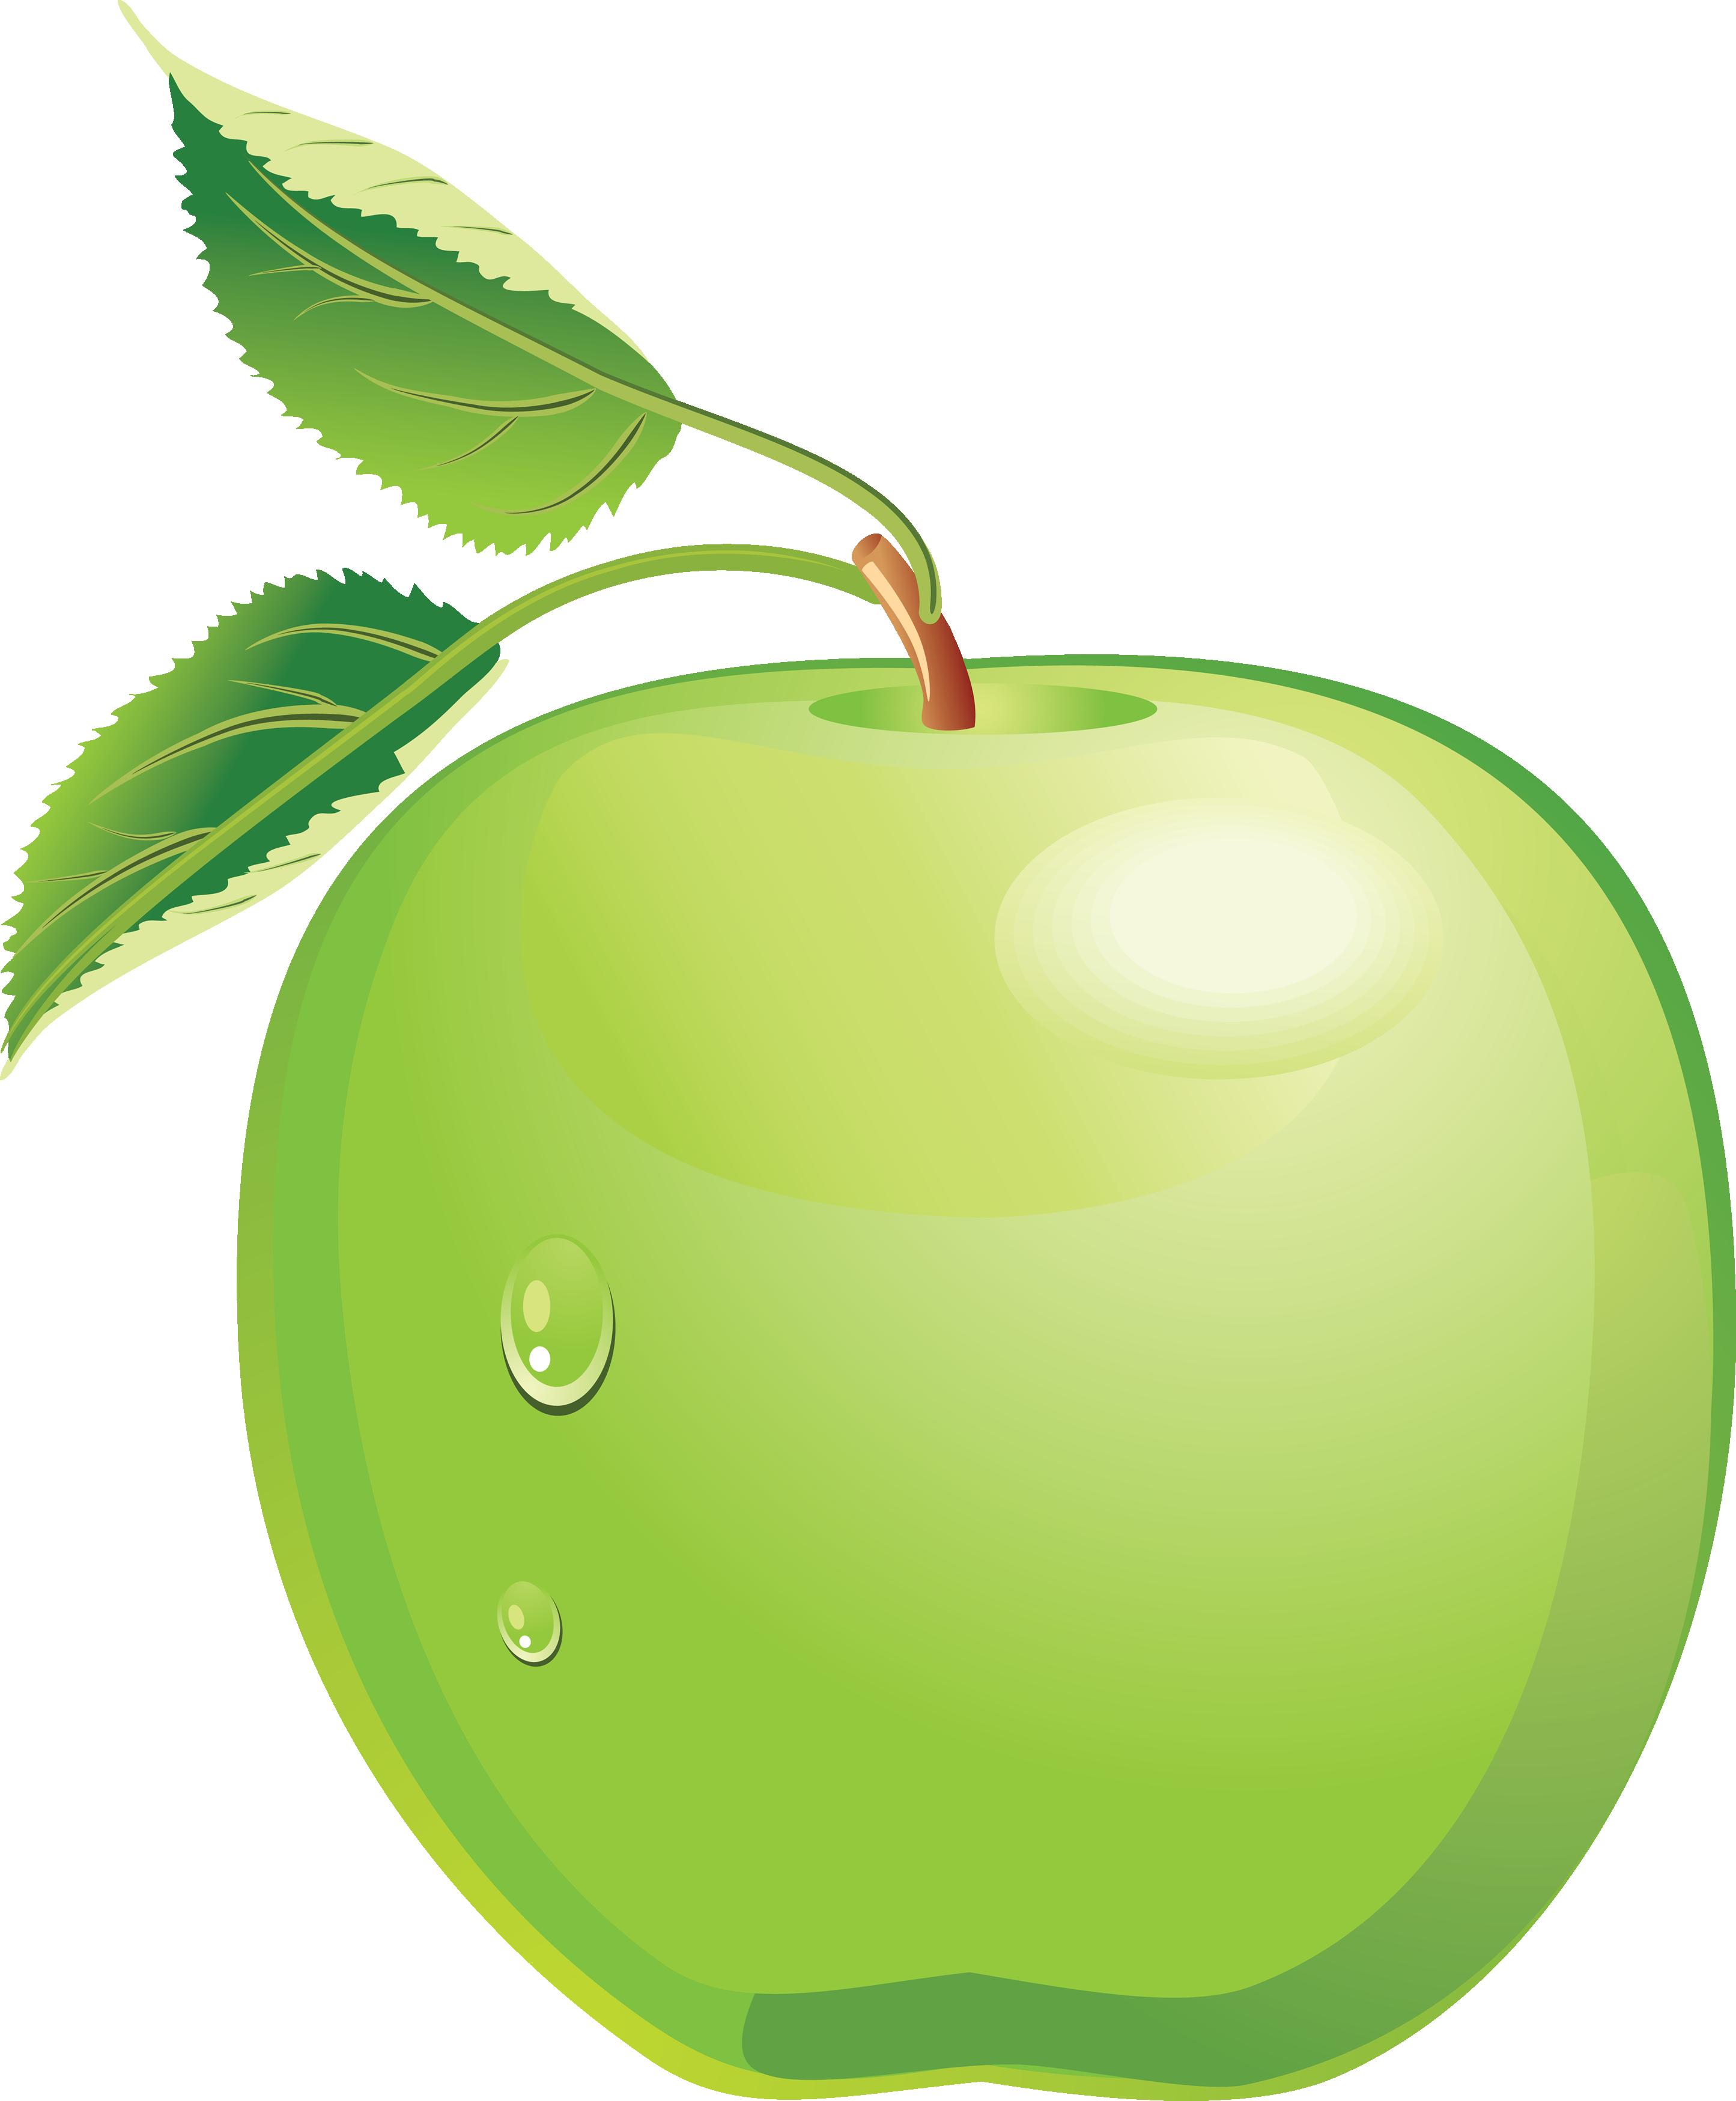 Transparency Apple Transparent Image Green Apple Fruit Cartoon Fruits Drawing